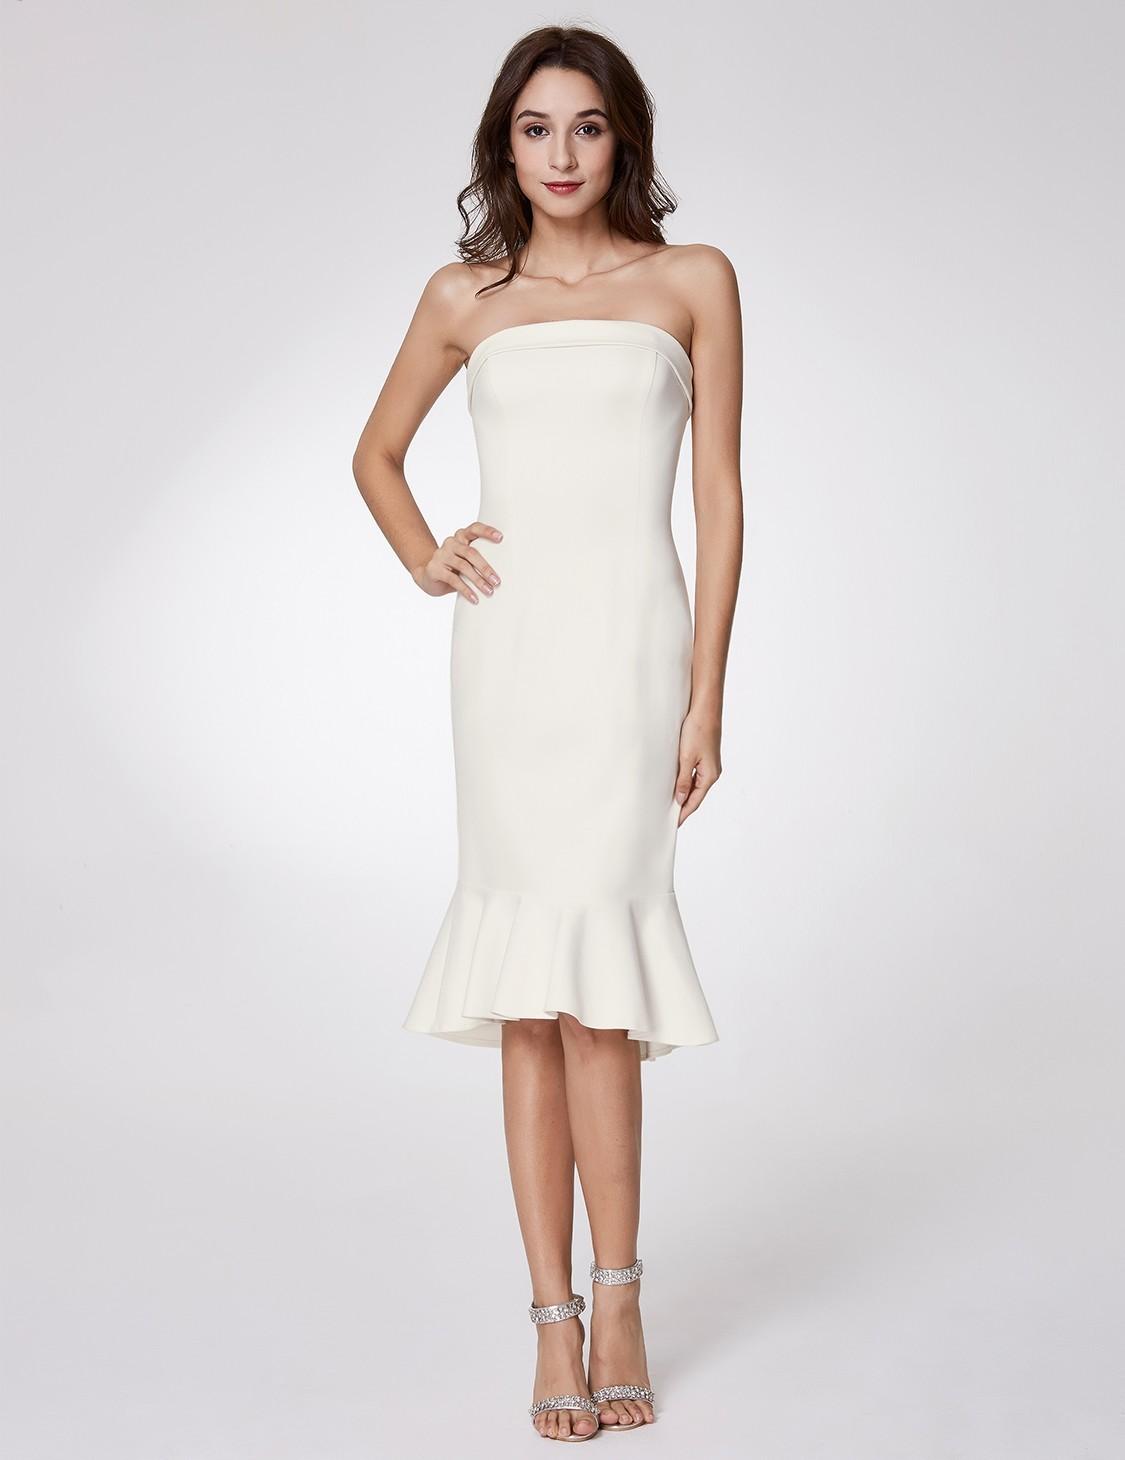 Ever-Pretty-Bodycon-Cocktail-Dresses-Women-039-s-Midi-White-Evening-Dresses-05969